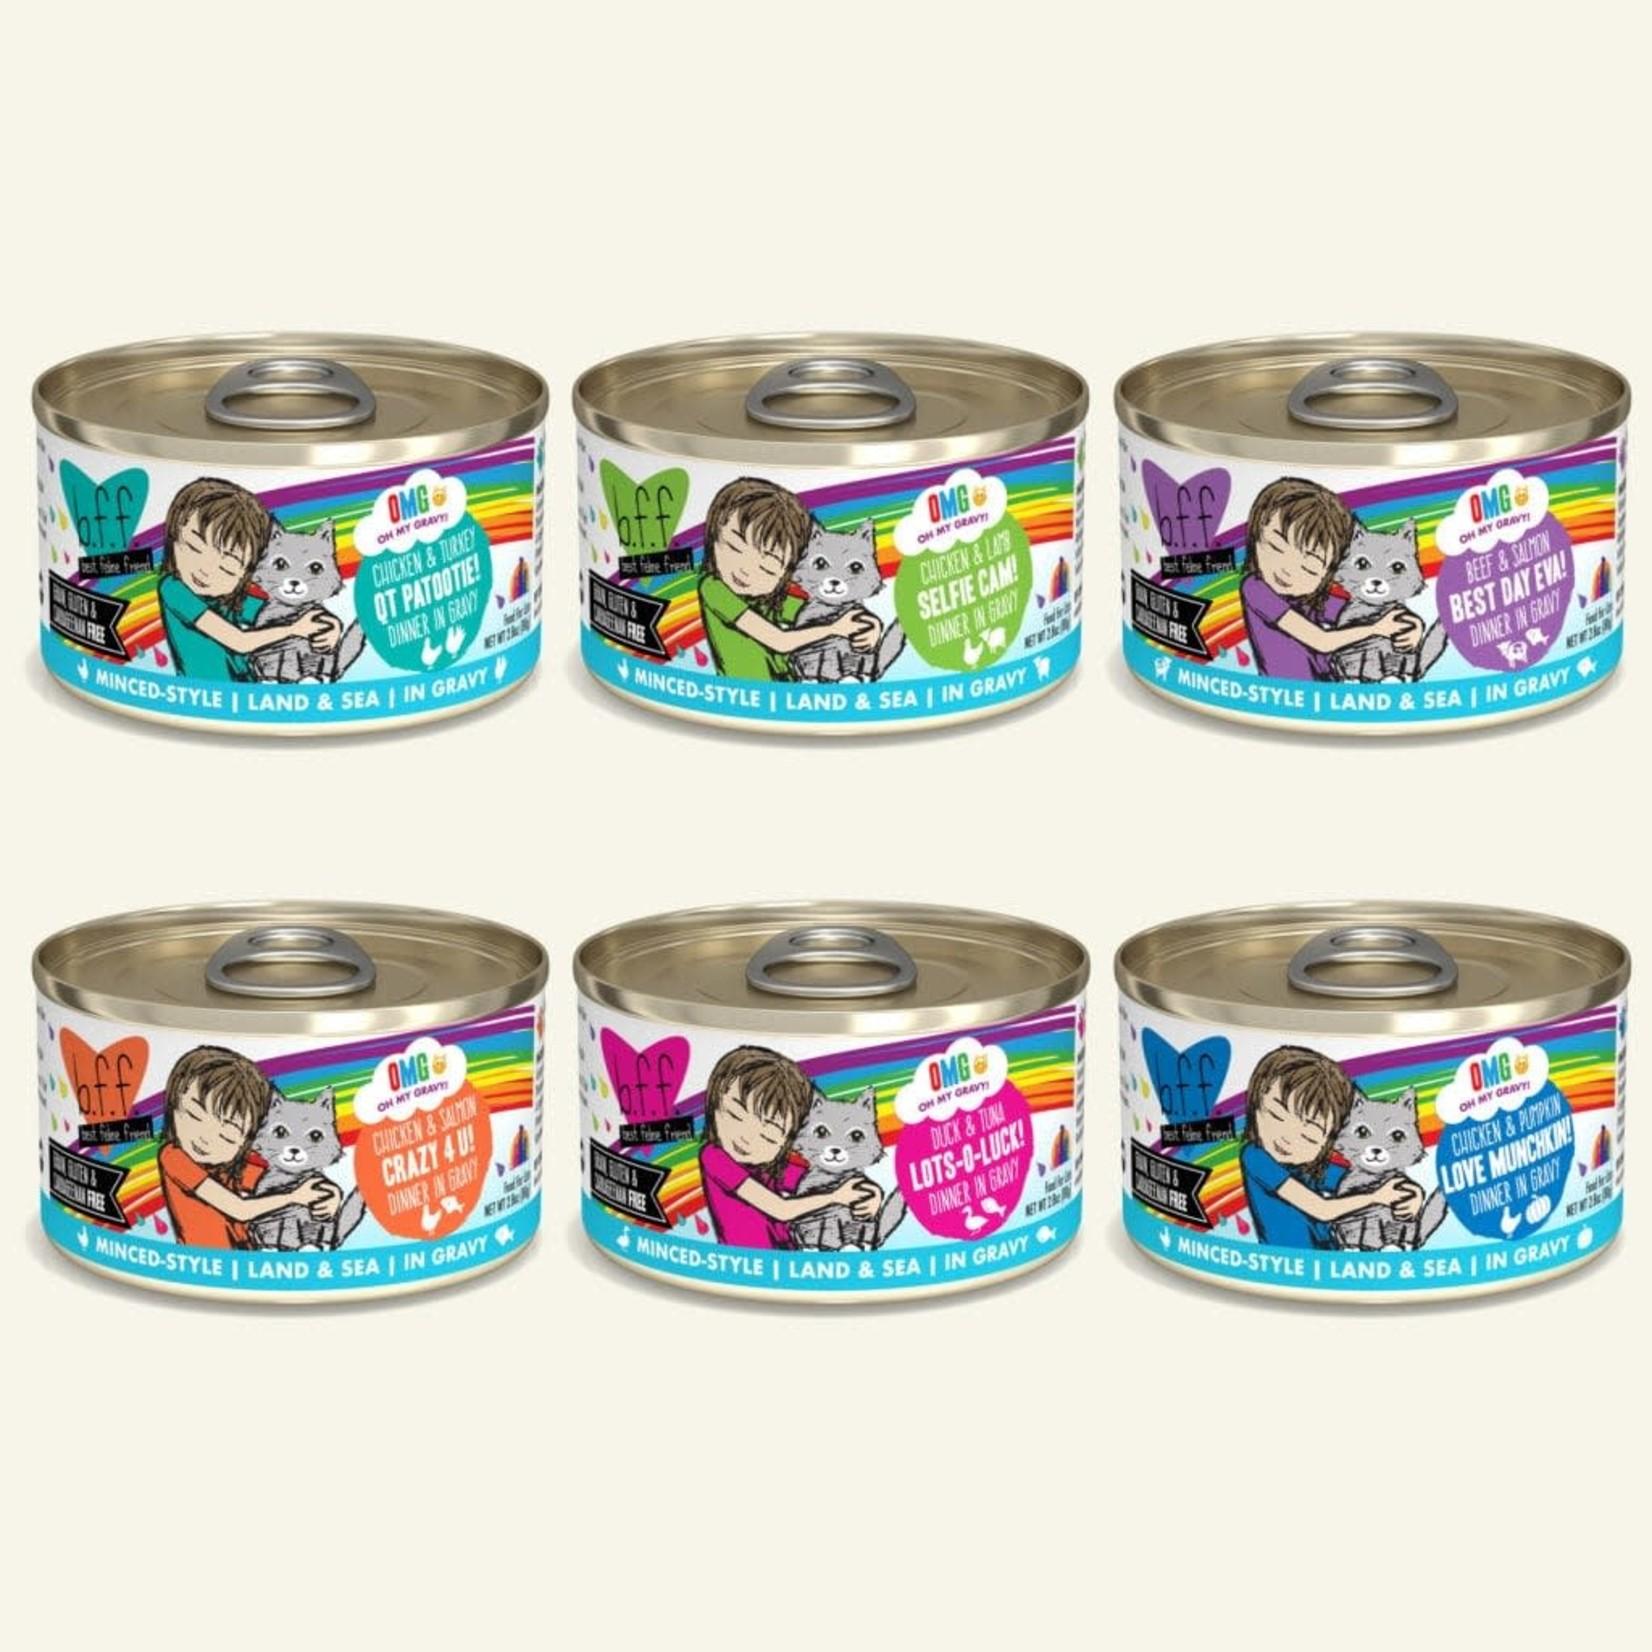 Weruva BFF OMG Rainbow Road Variety Pack 12 - 2.8 OZ Cans